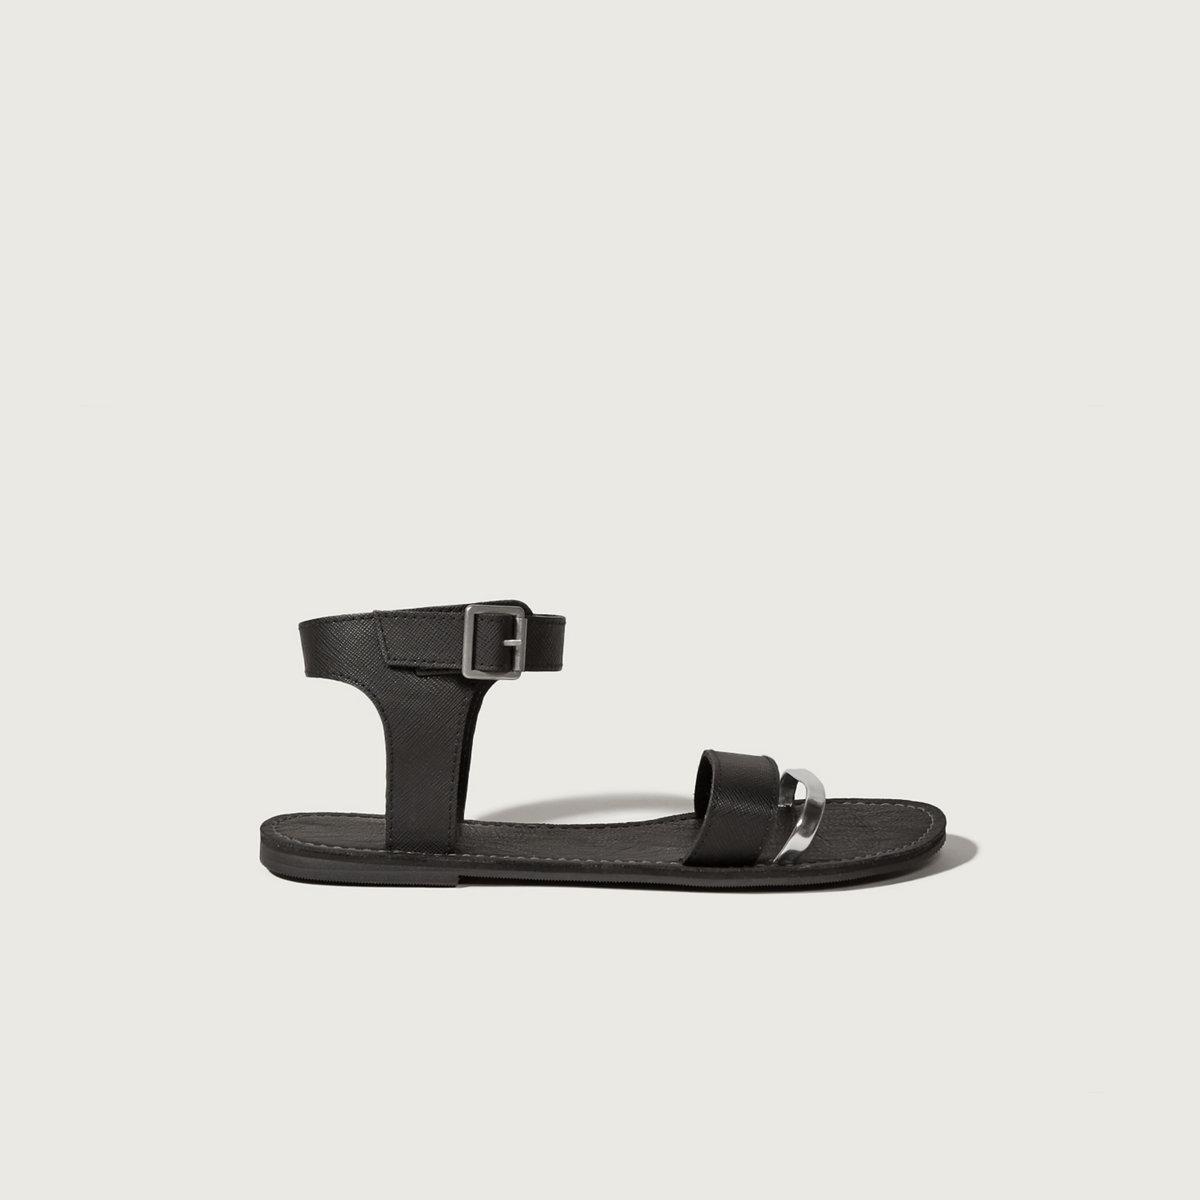 Metallic Strappy Sandals